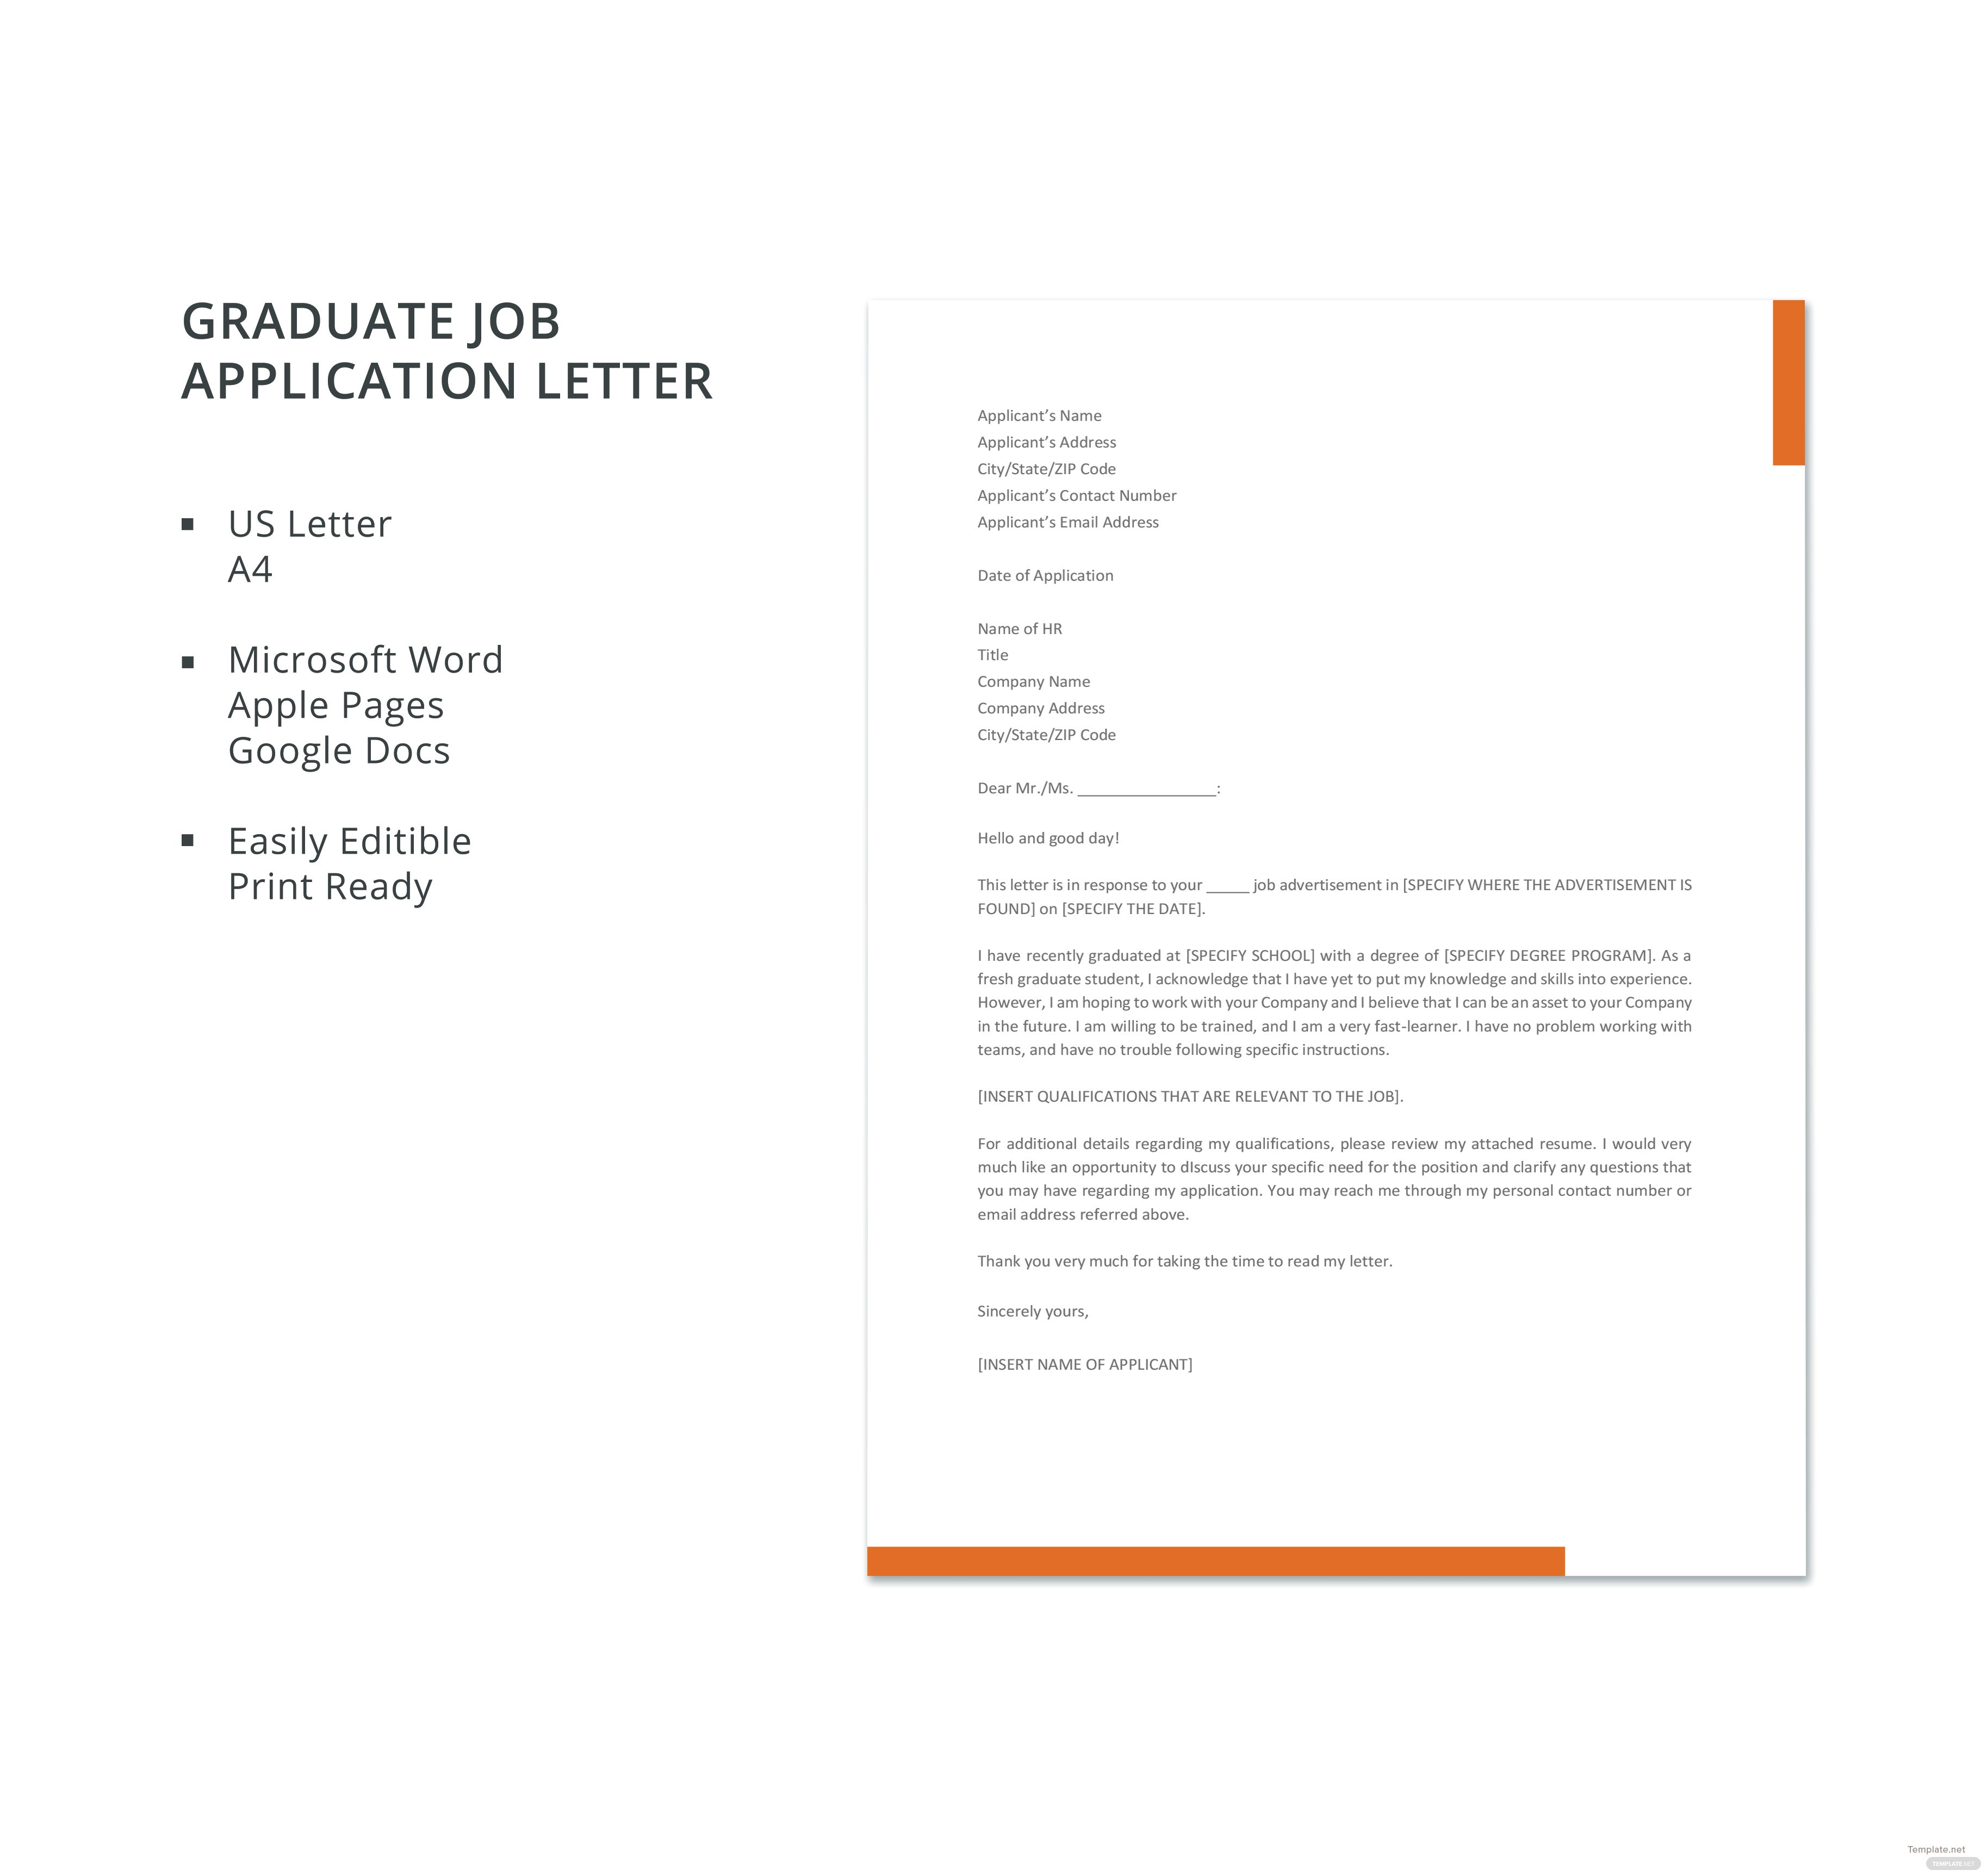 free graduate job application letter template in microsoft word apple pages google docs pdf. Black Bedroom Furniture Sets. Home Design Ideas